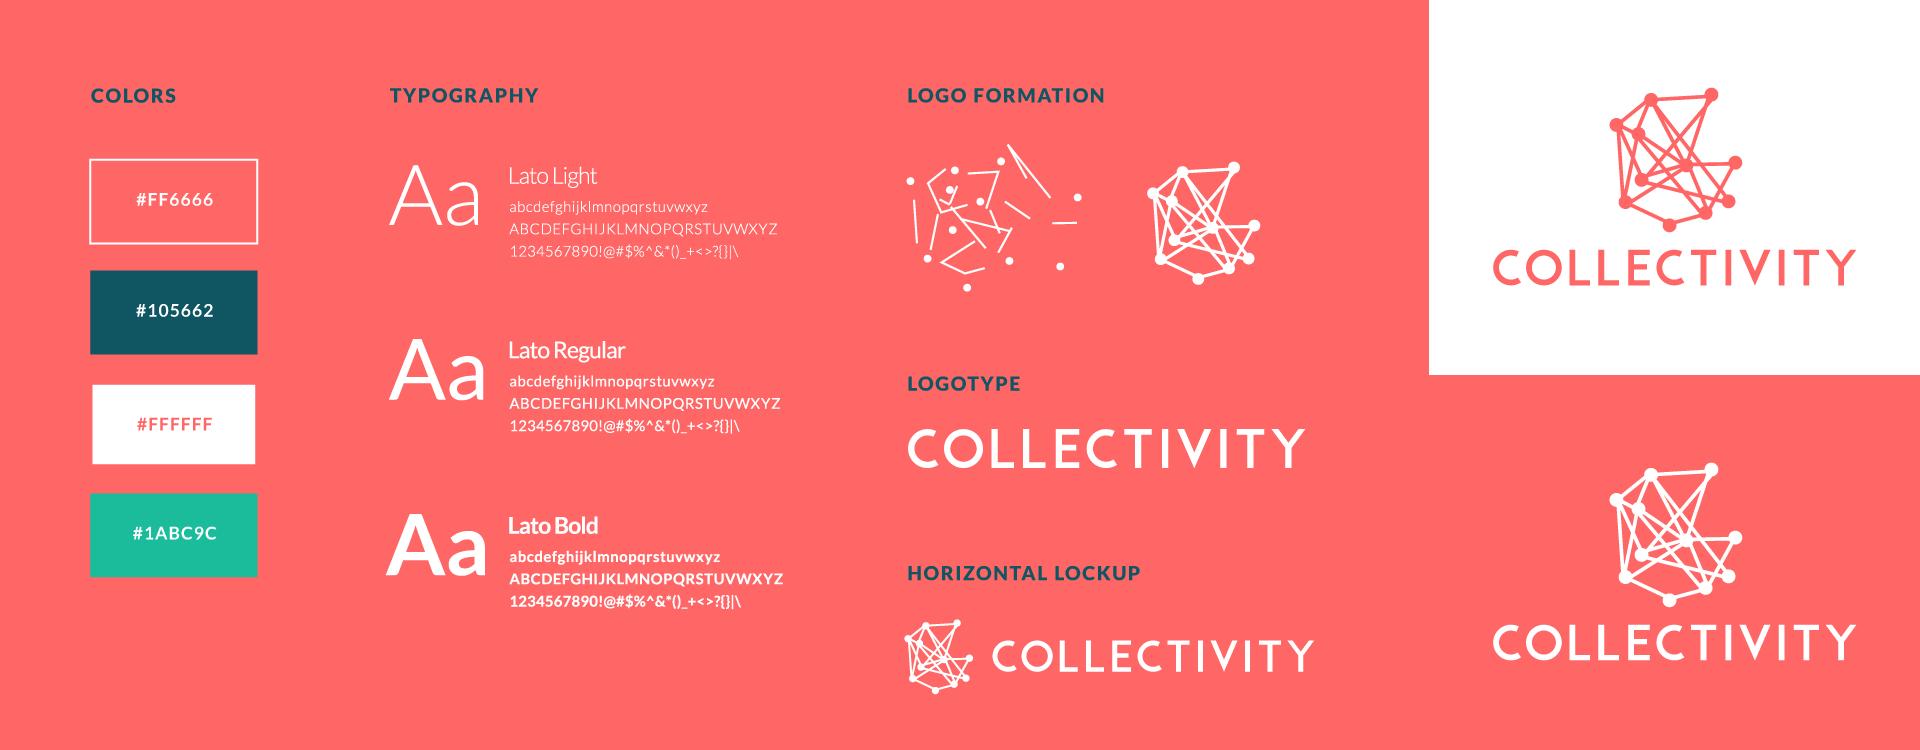 SS Web-Collectivity-Branding